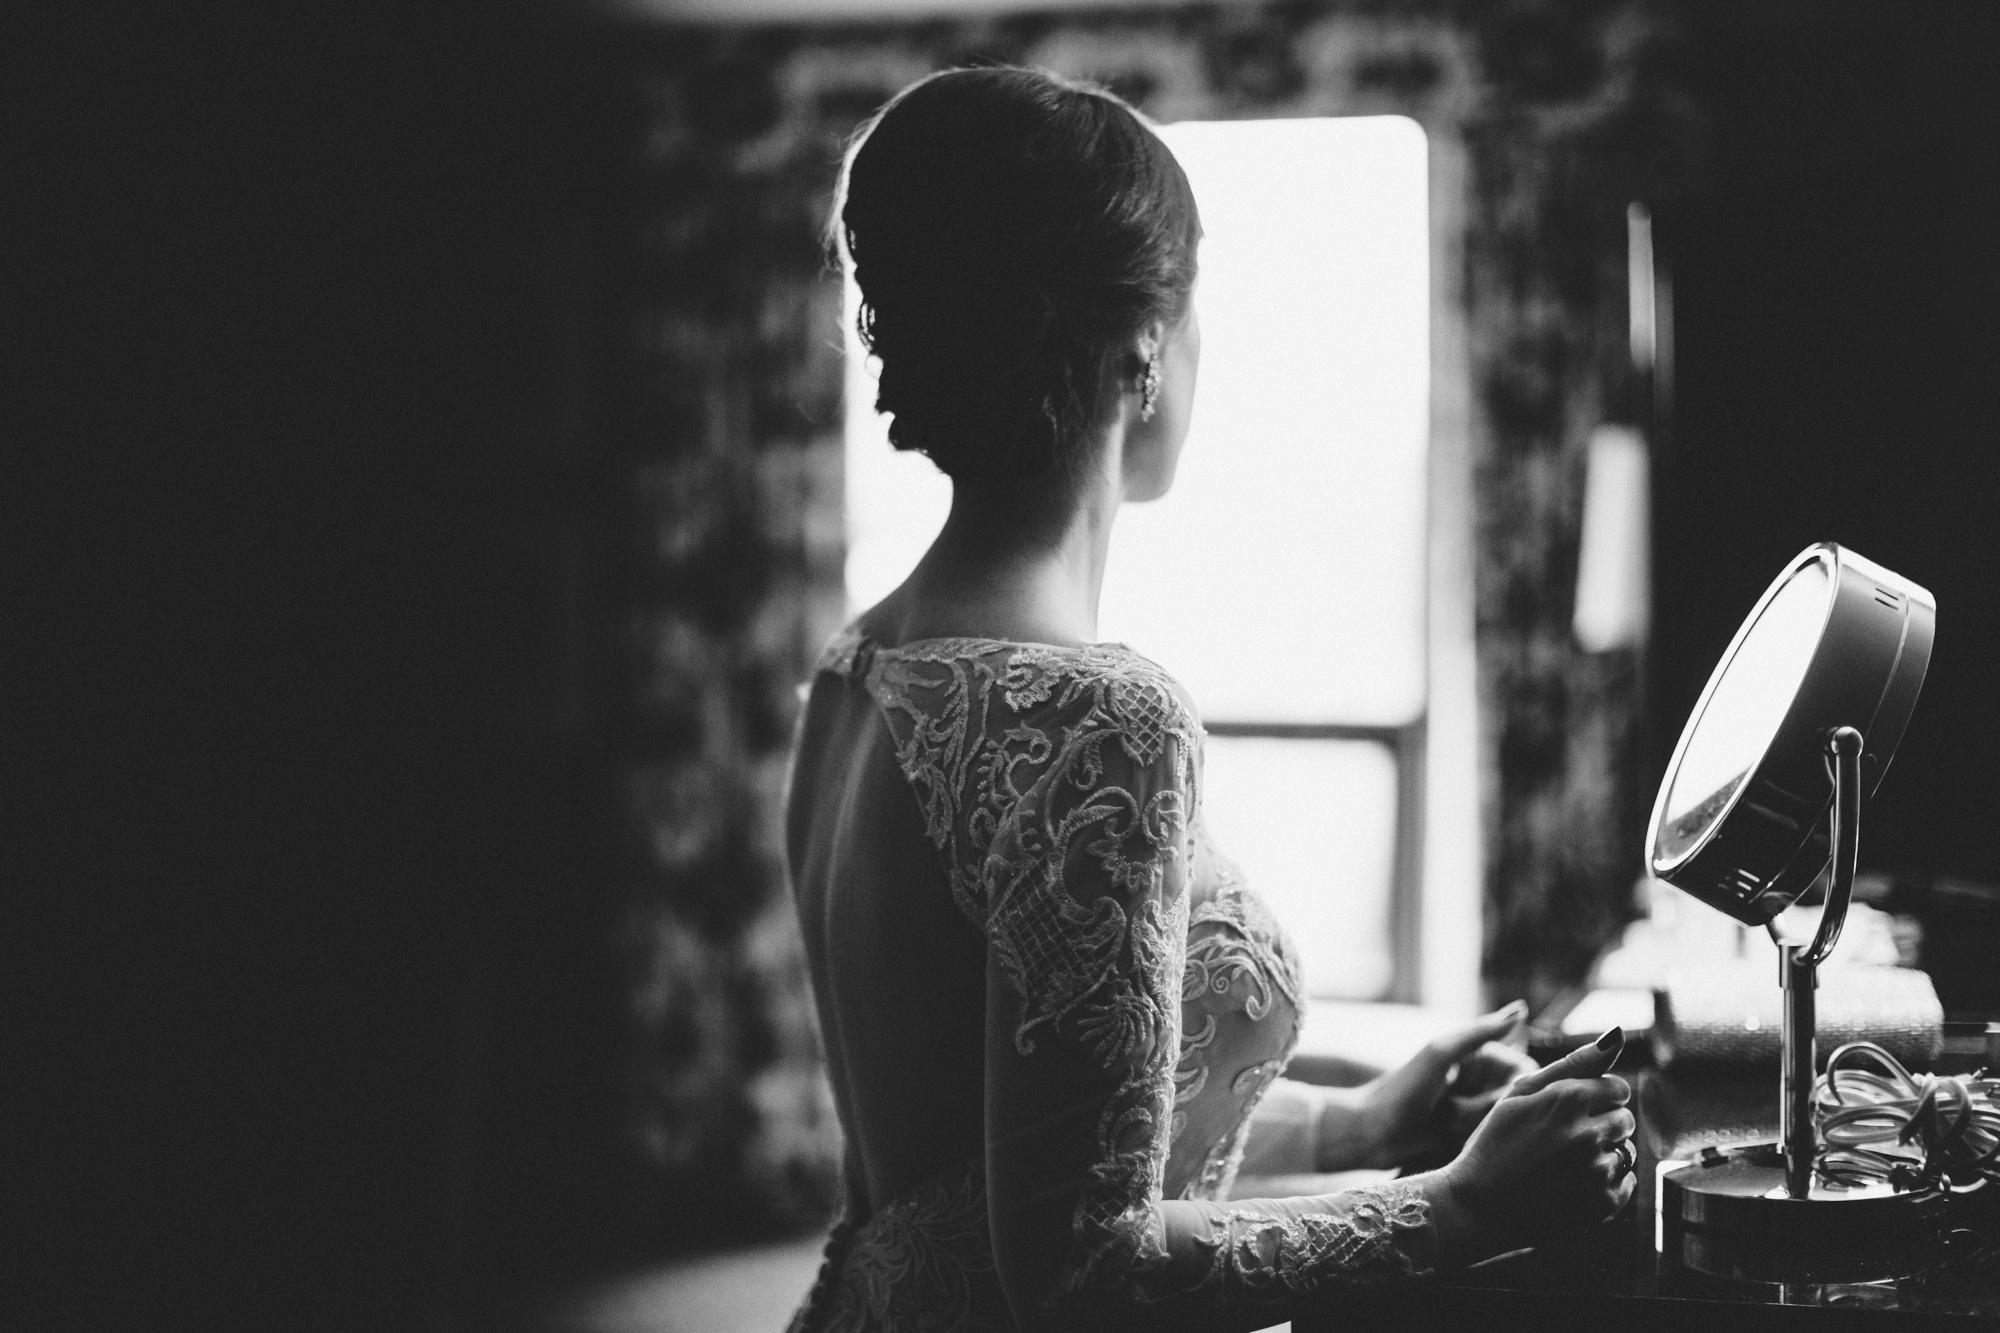 edmonton calgary alberta wedding photographer53.jpg